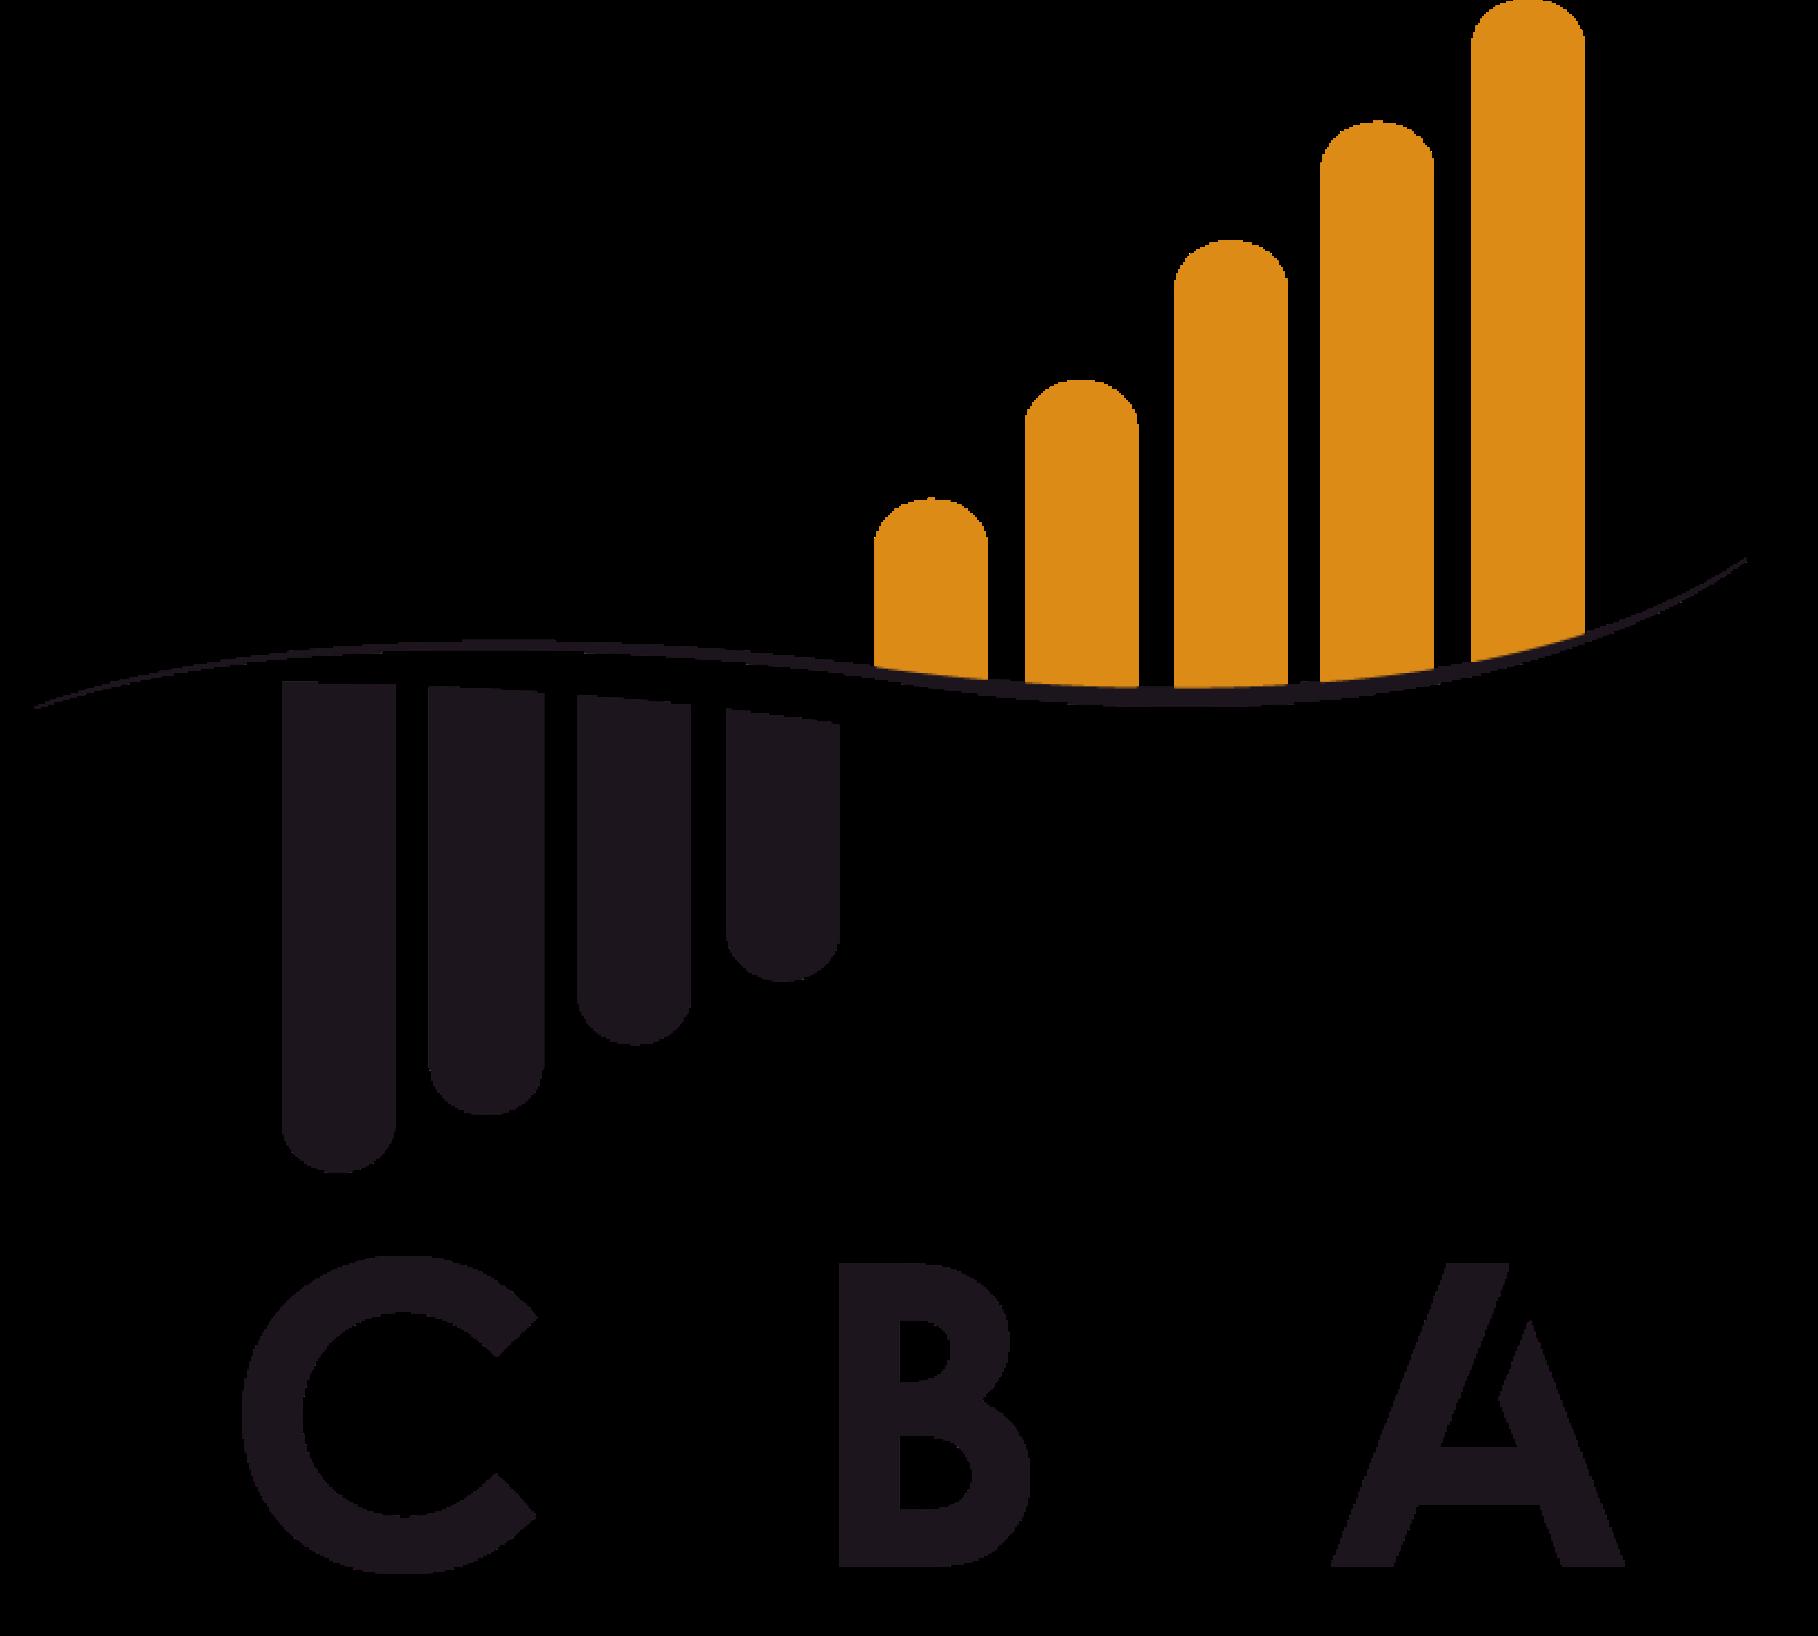 Asesores CBA